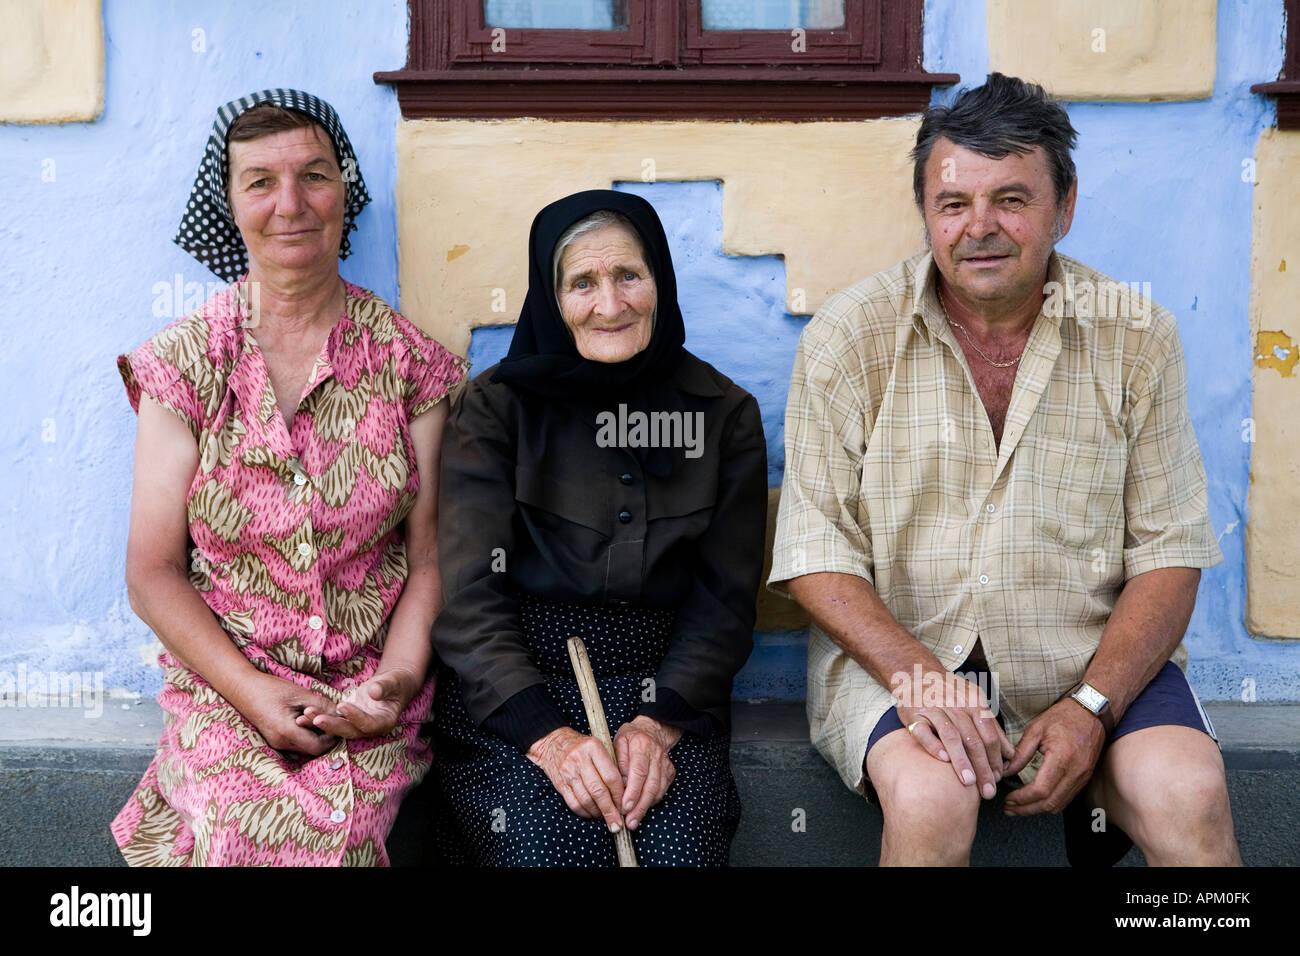 A peasant family in Transylvania, Romania - Stock Image